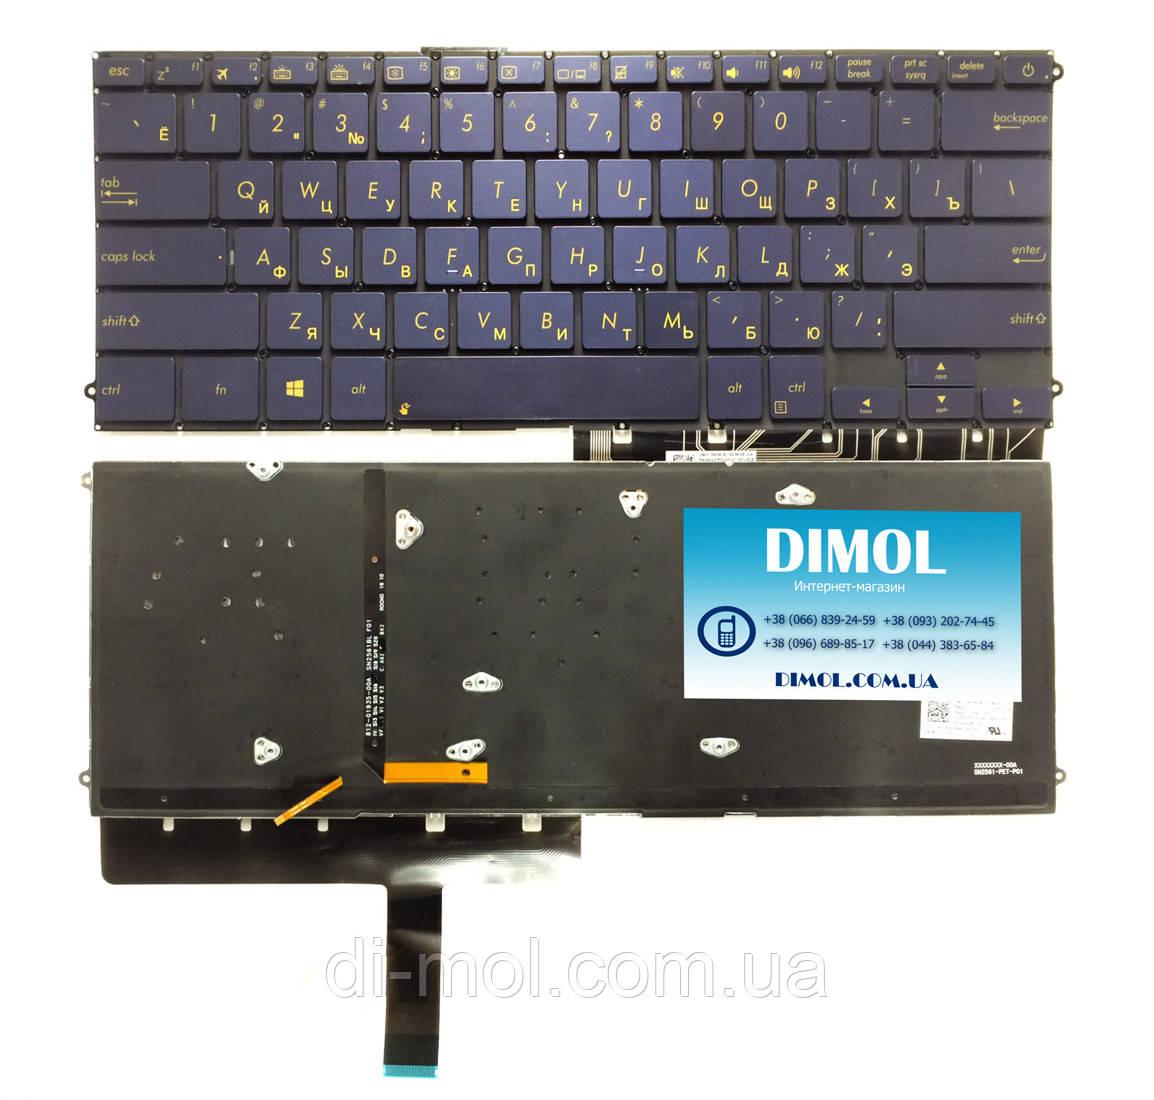 Оригинальная клавиатура для ноутбука Asus ZenBook 3 Deluxe UX490, UX490UA series, ru, темно-синий, подсветка